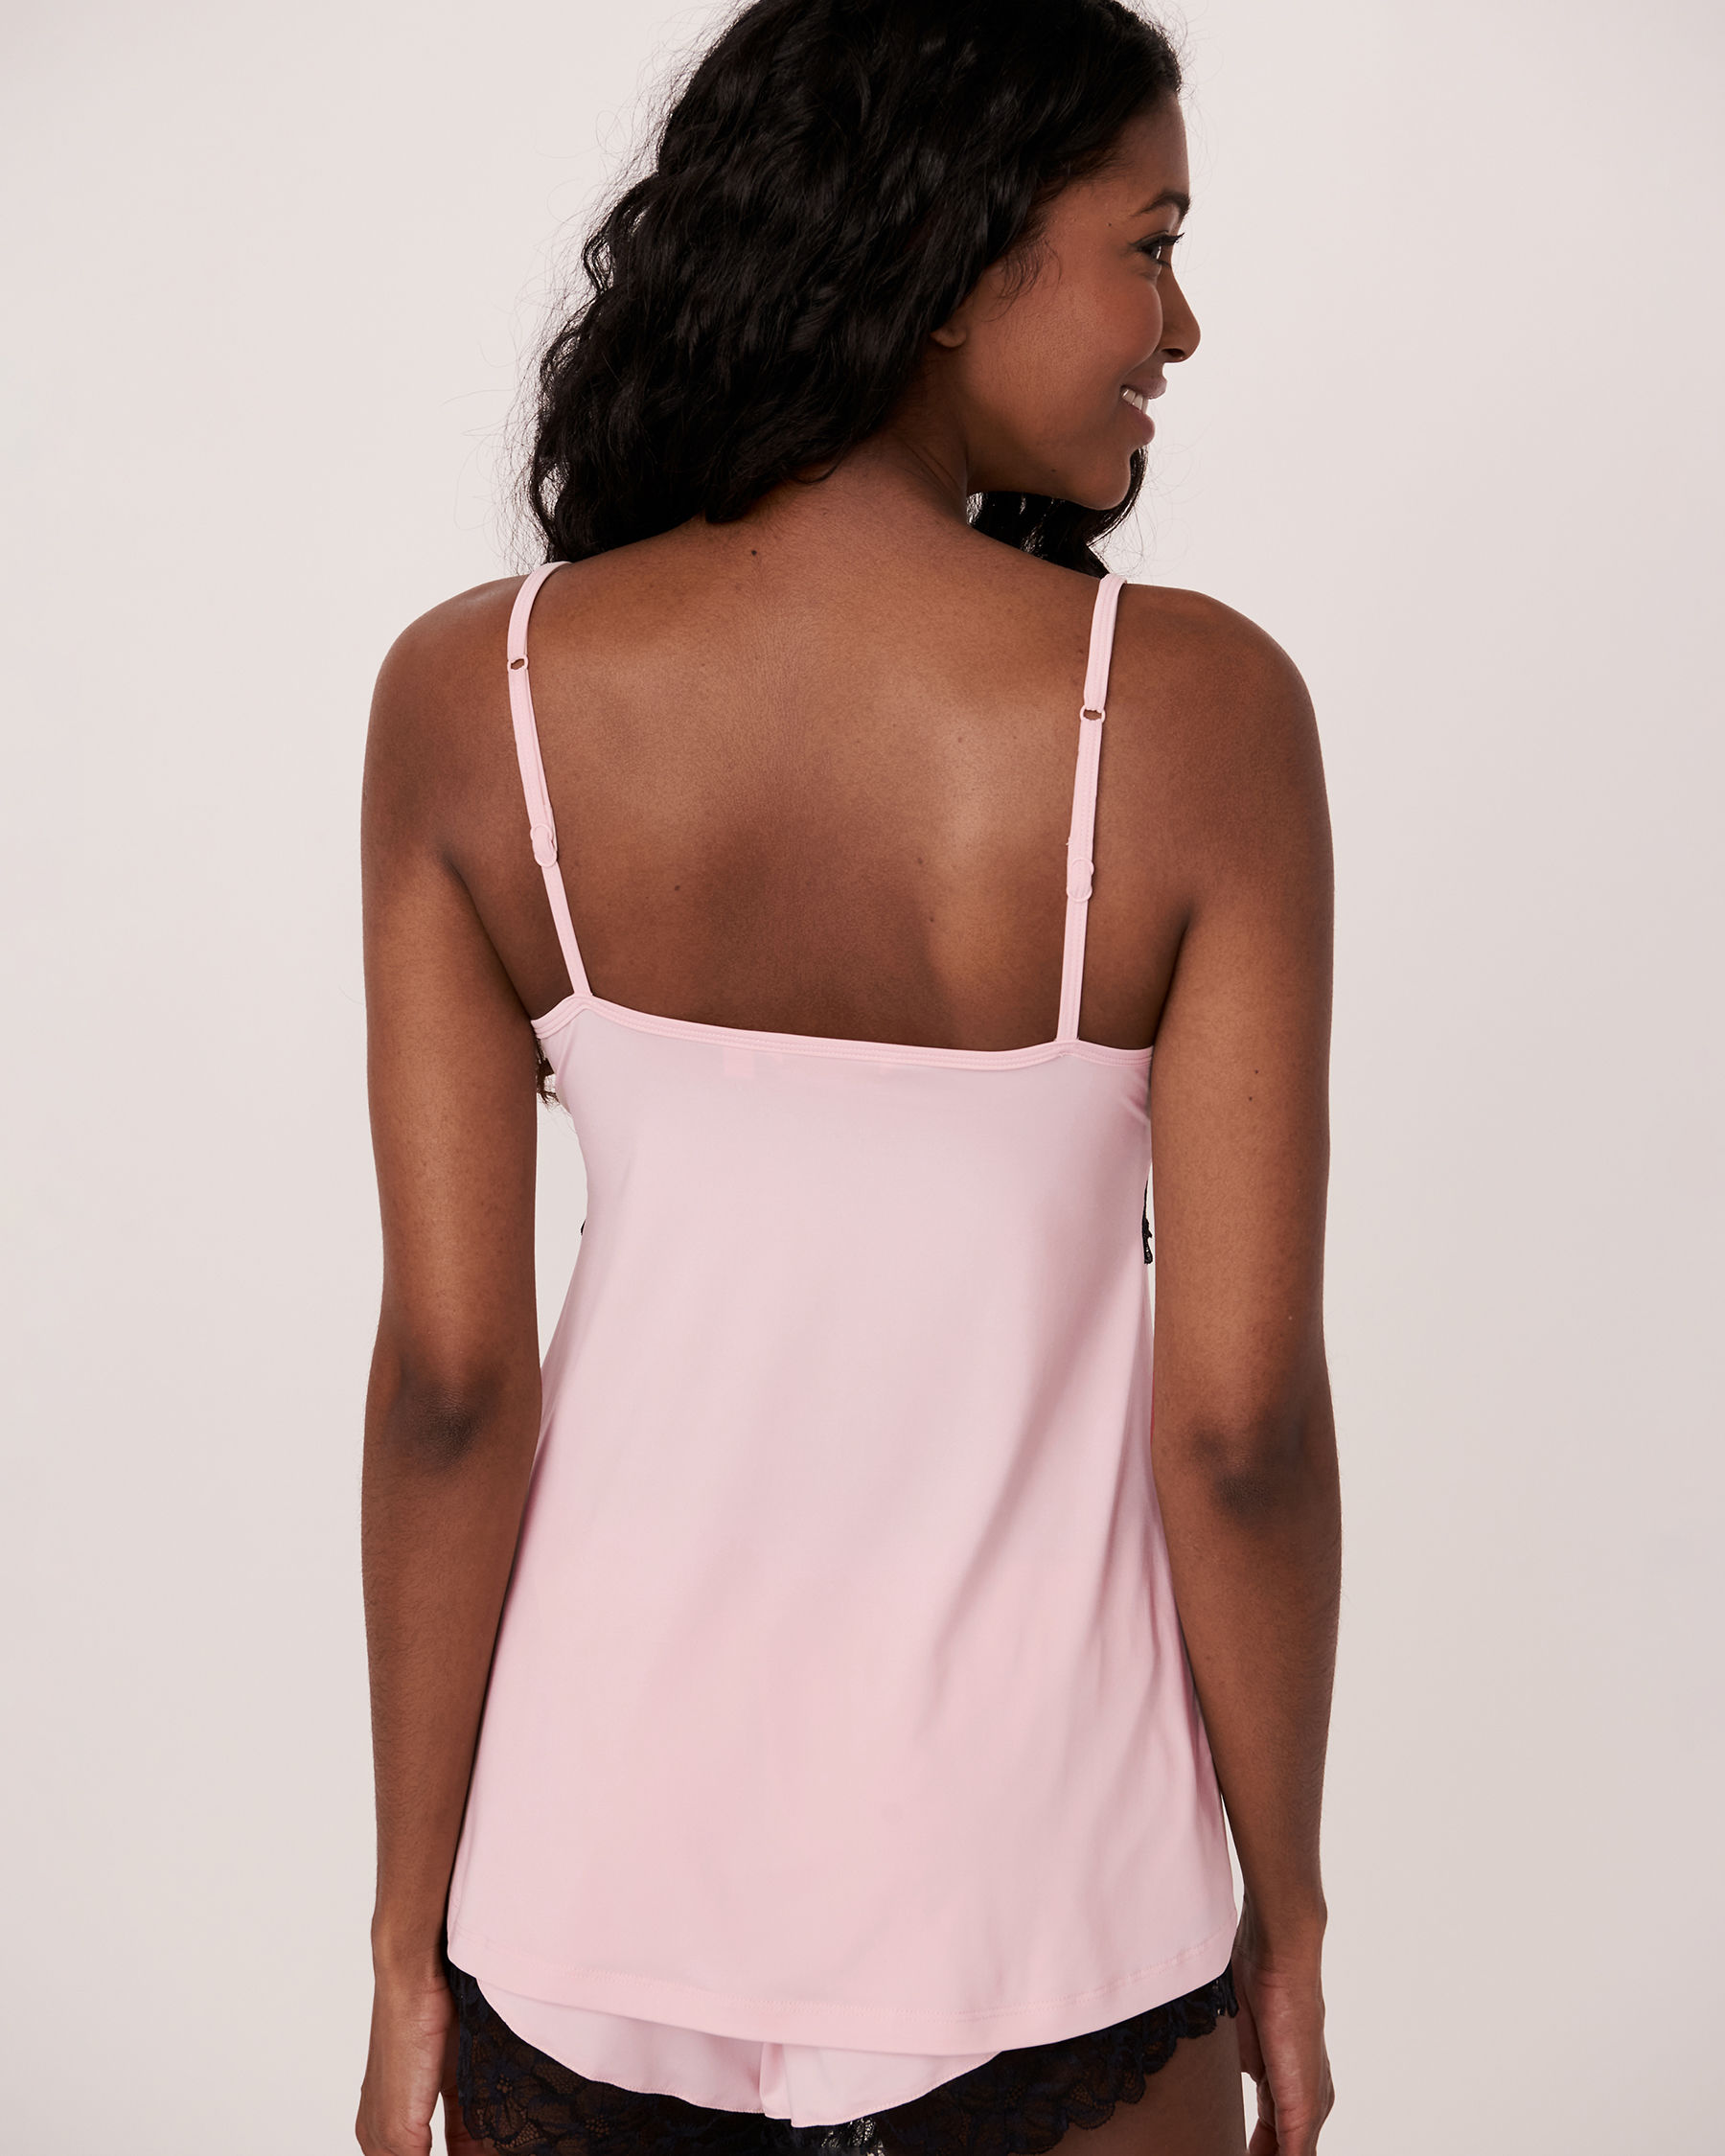 LA VIE EN ROSE Recycled Fibers Lace Trim Cami Light pink 40100075 - View2